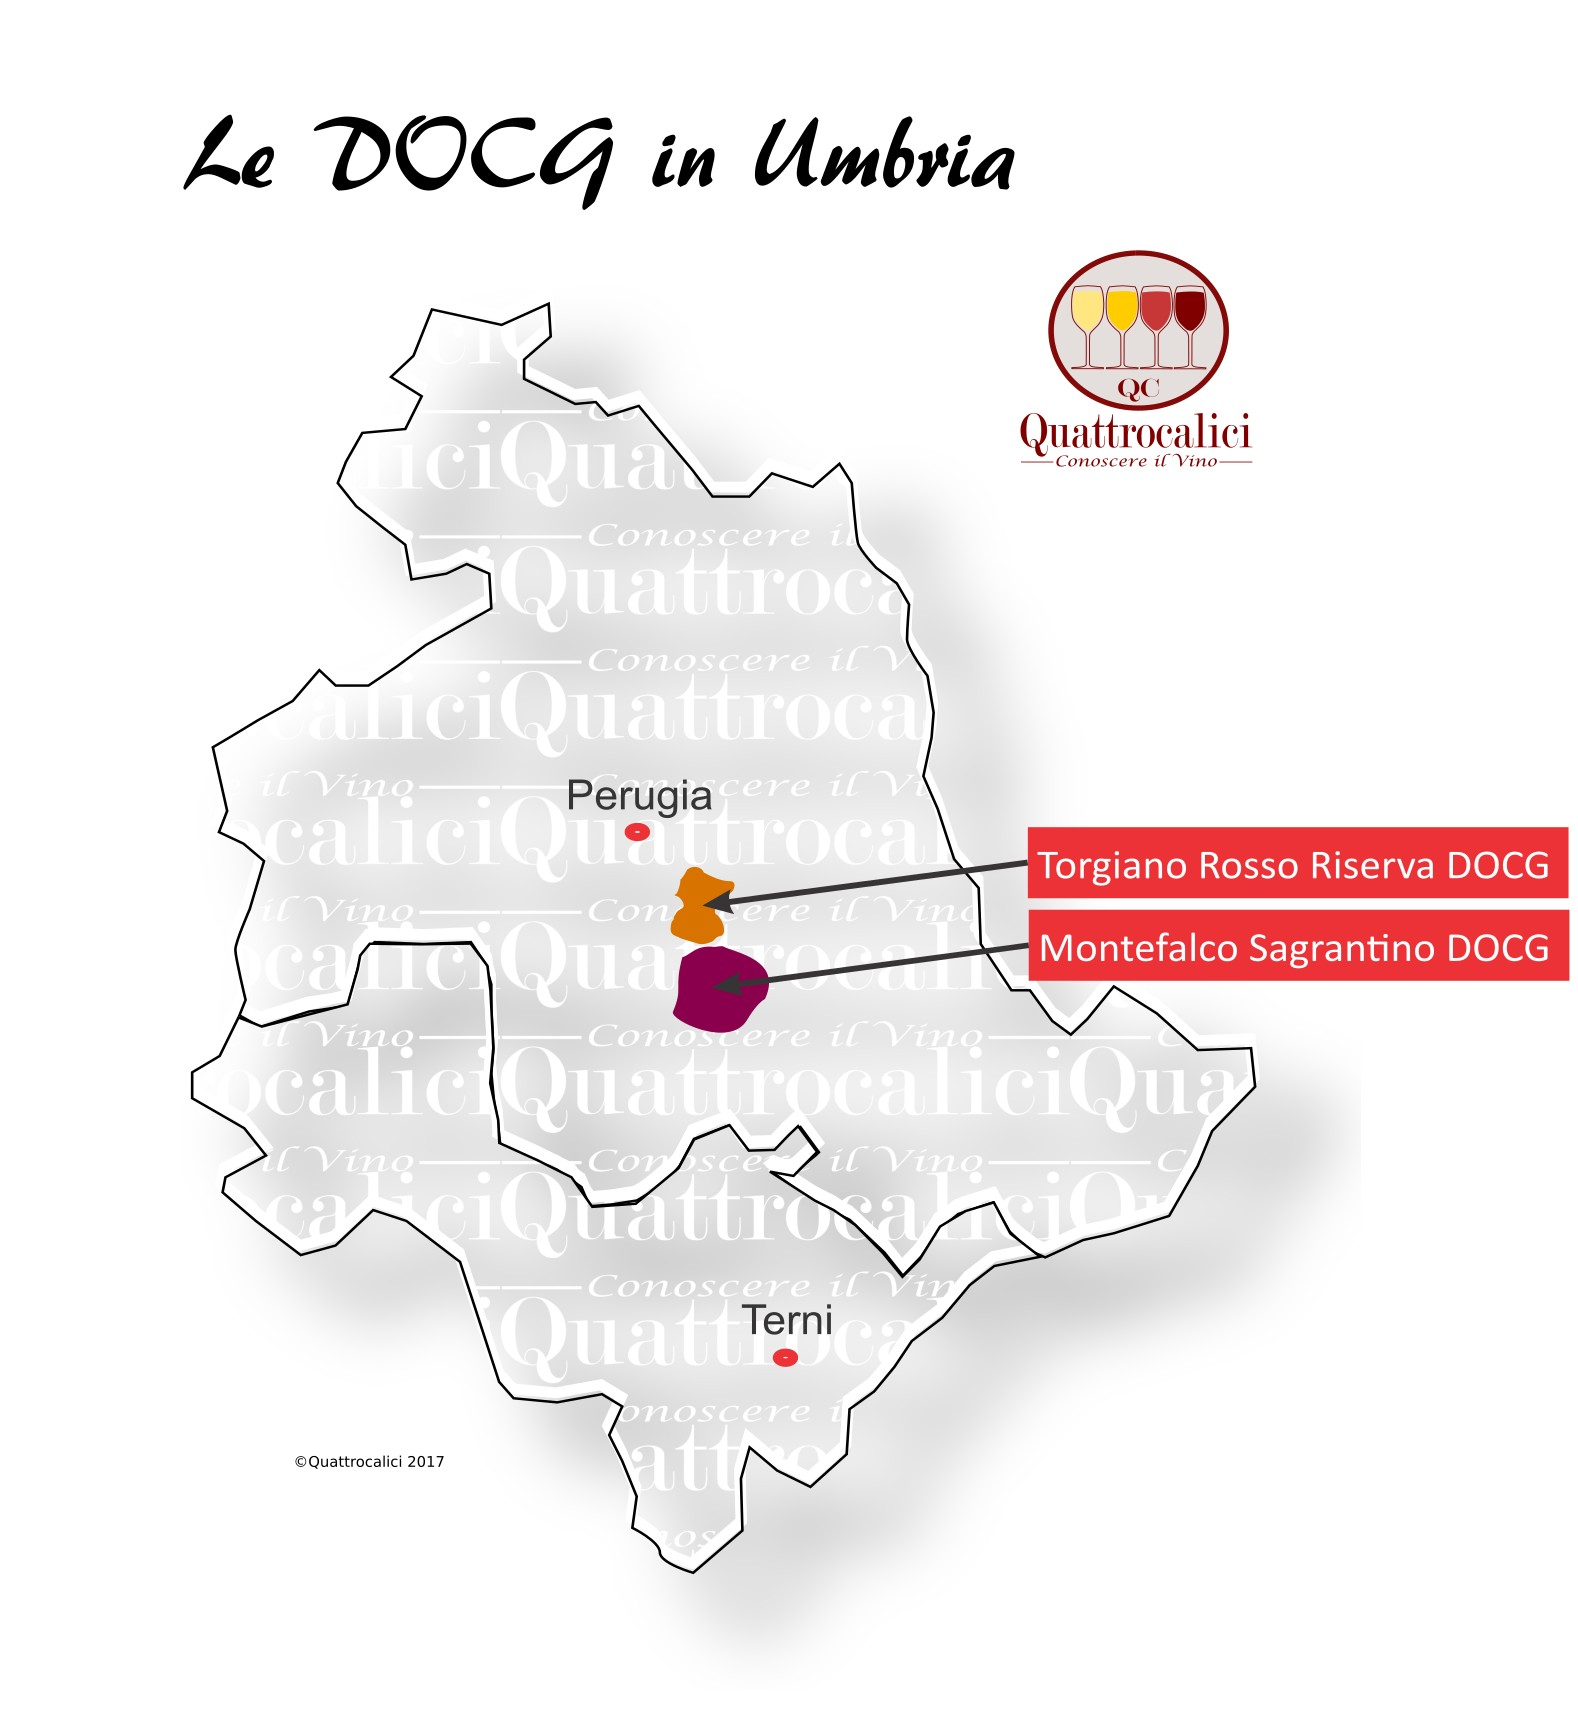 Le DOCG in Umbria